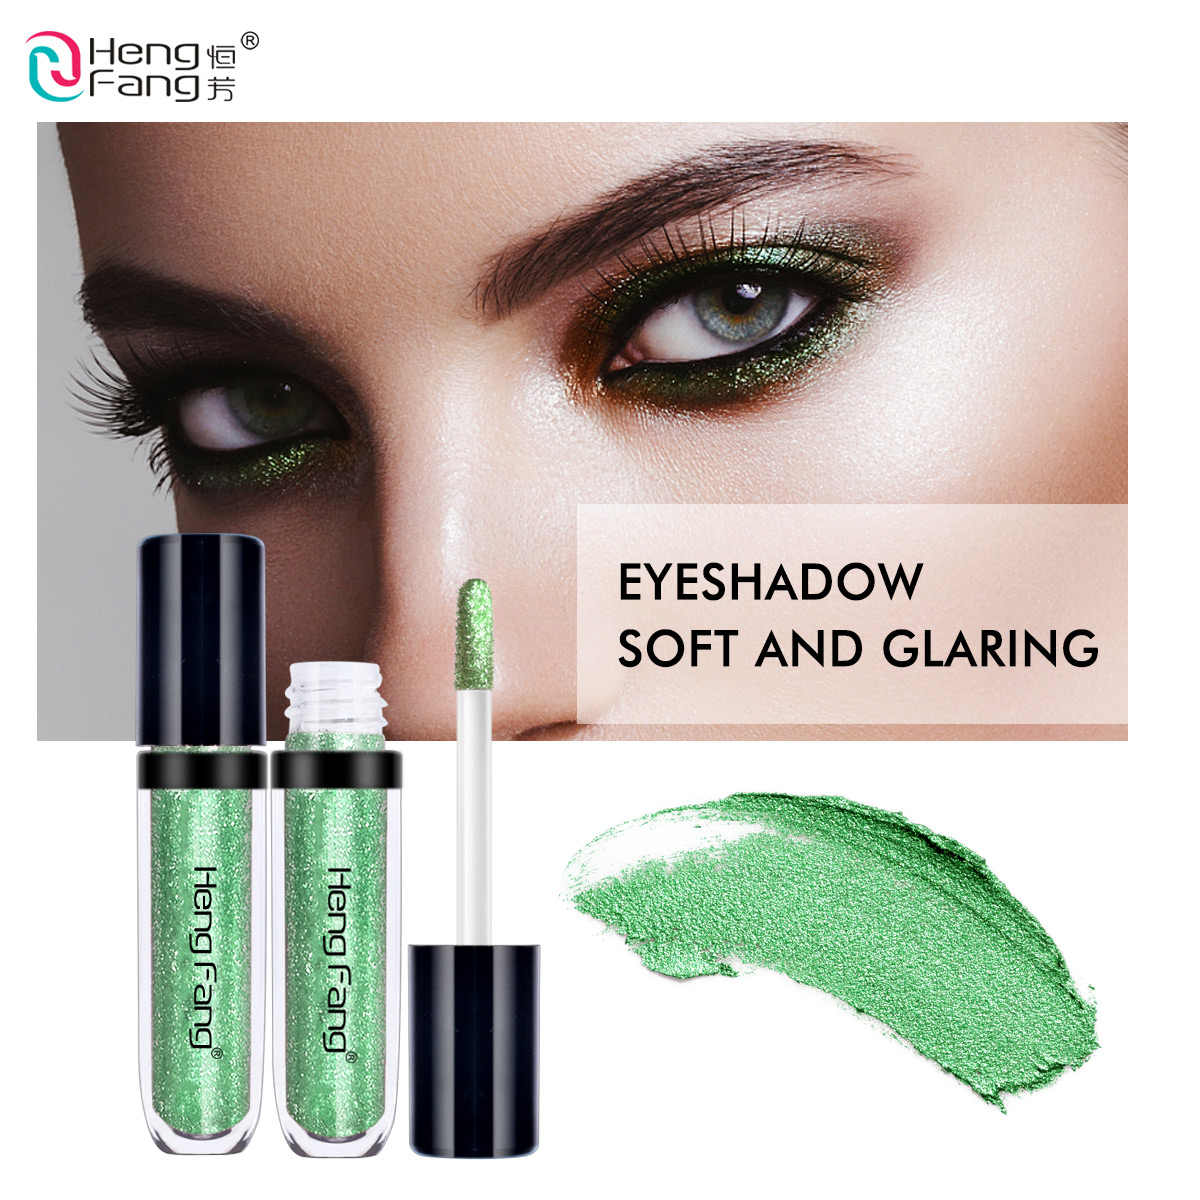 Macio E Gritante 6 Cores Da Sombra sombra de Olho Líquido 1.7gX6 Beleza Olhos Maquiagem Marca HengFang # H6535